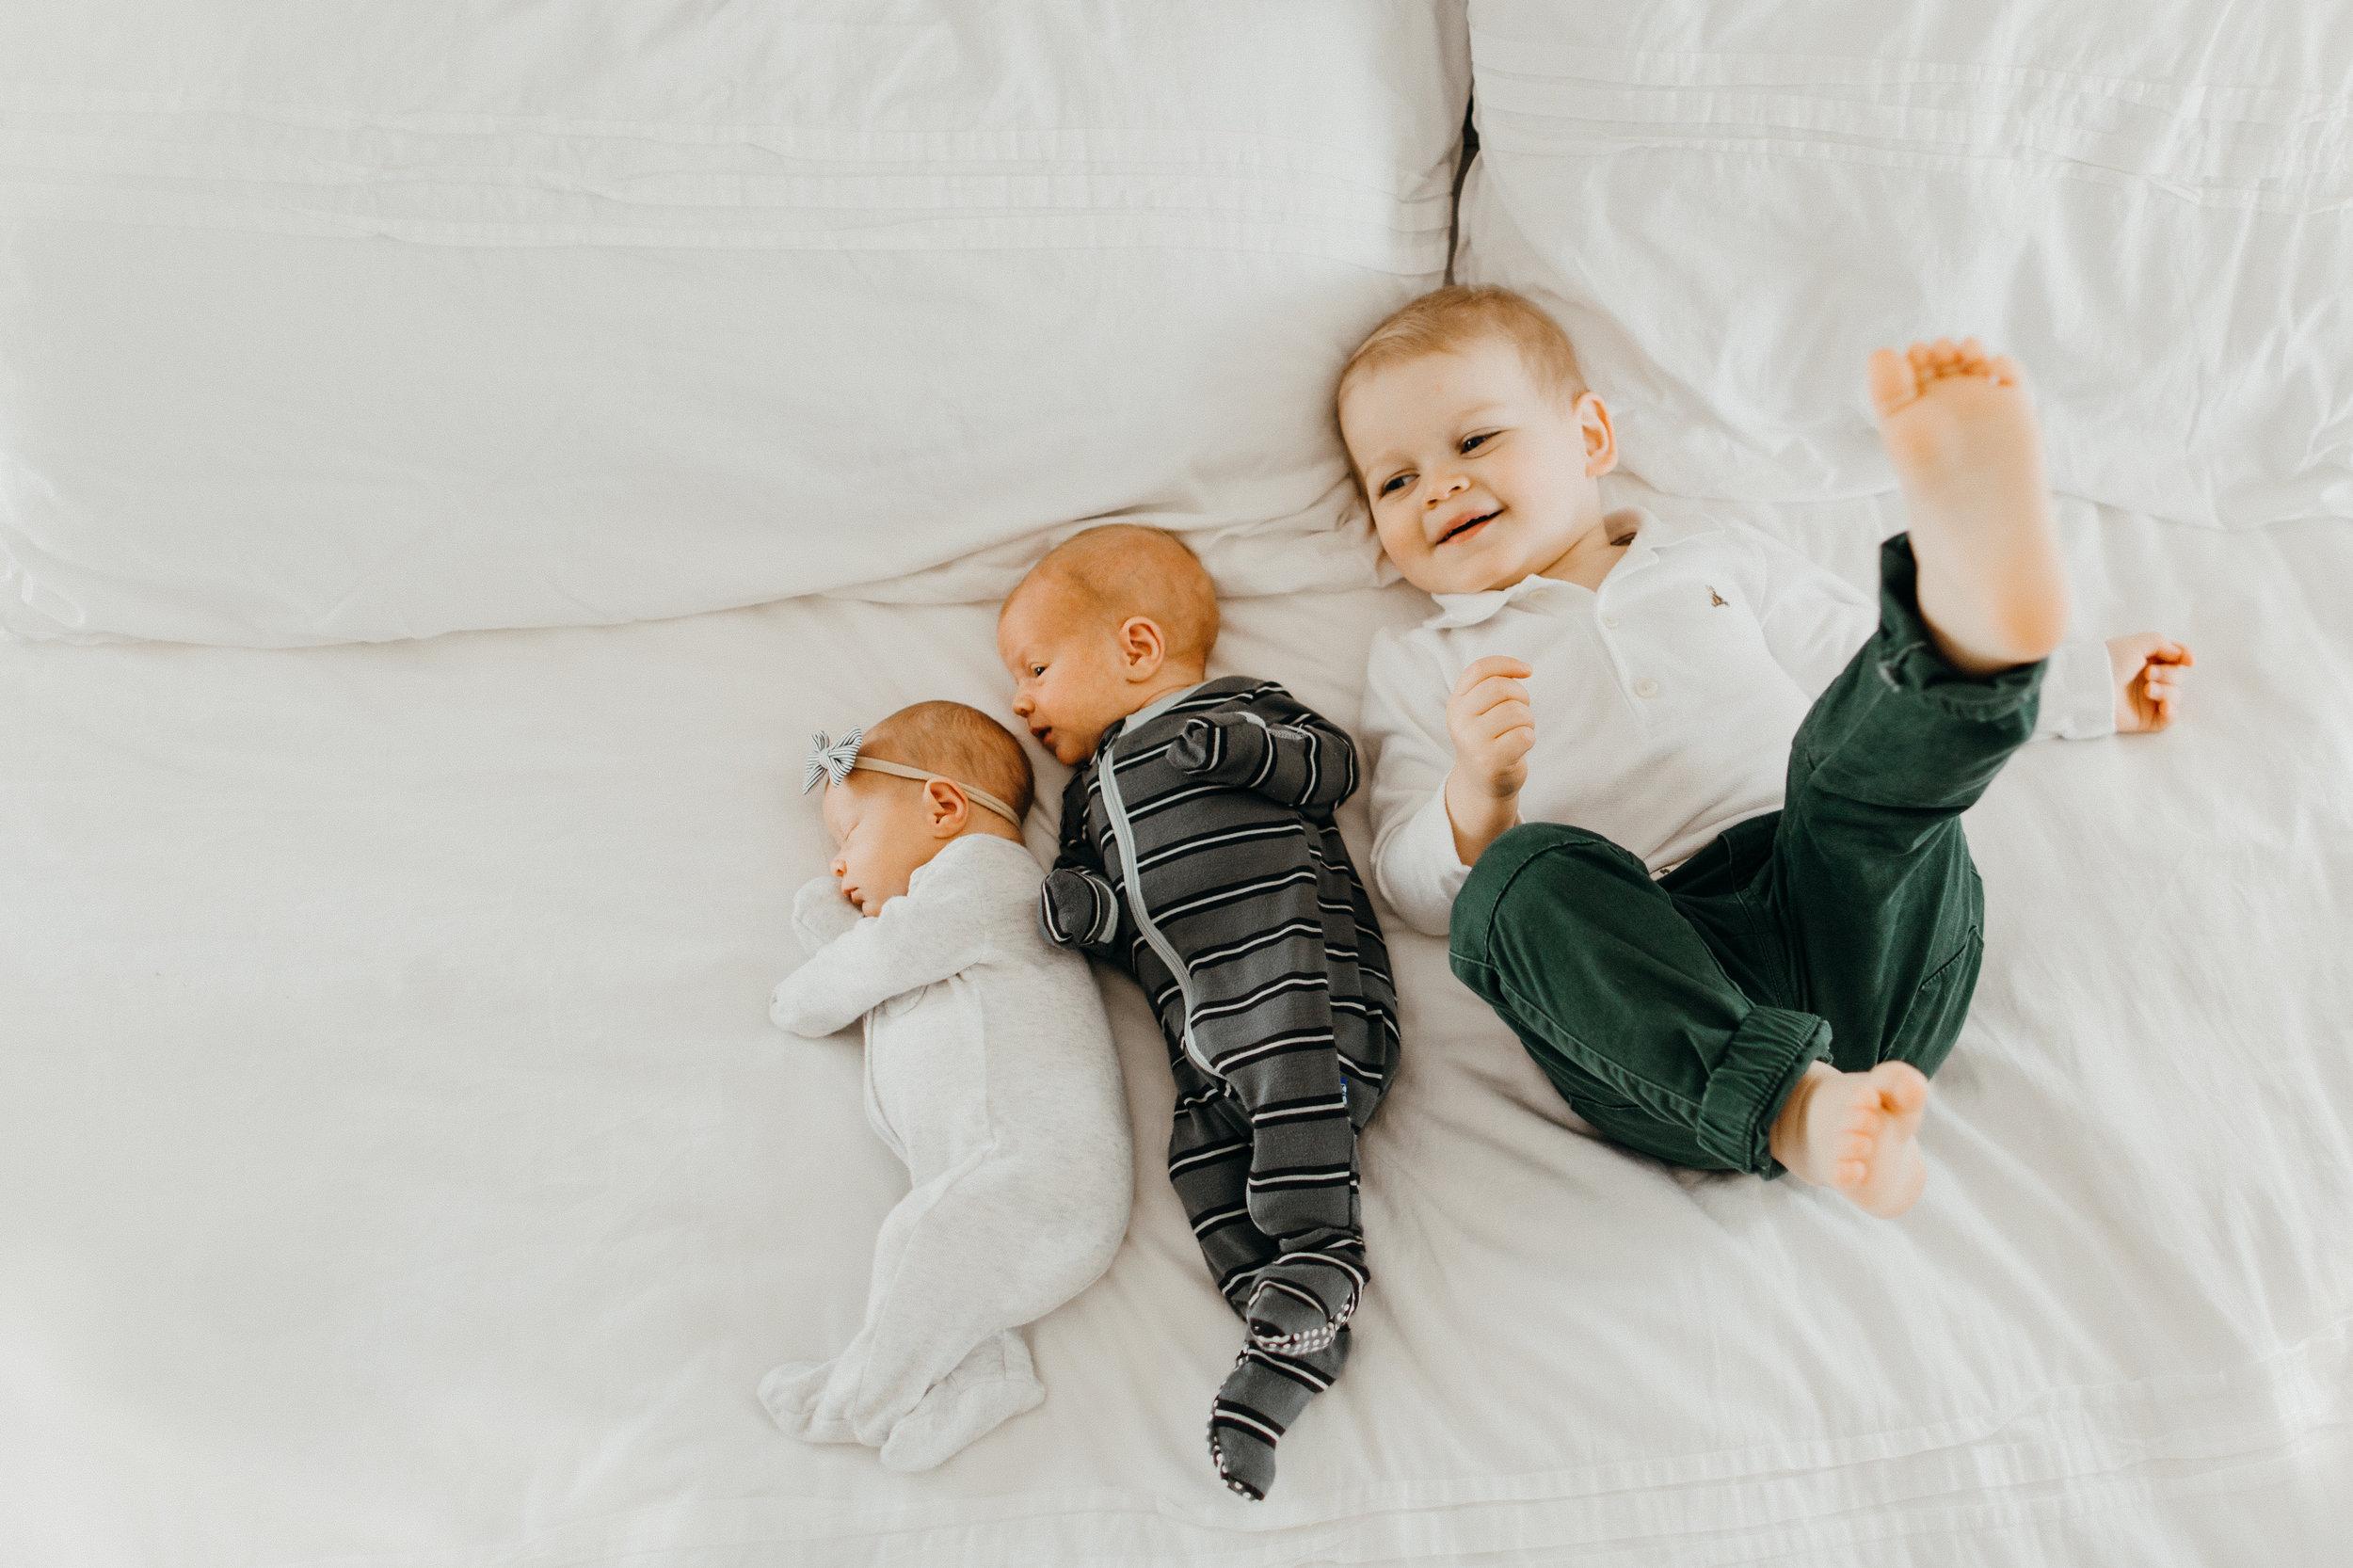 jamieleighmiller_inhome_newborn_photographer_omahanebraska-13.jpg